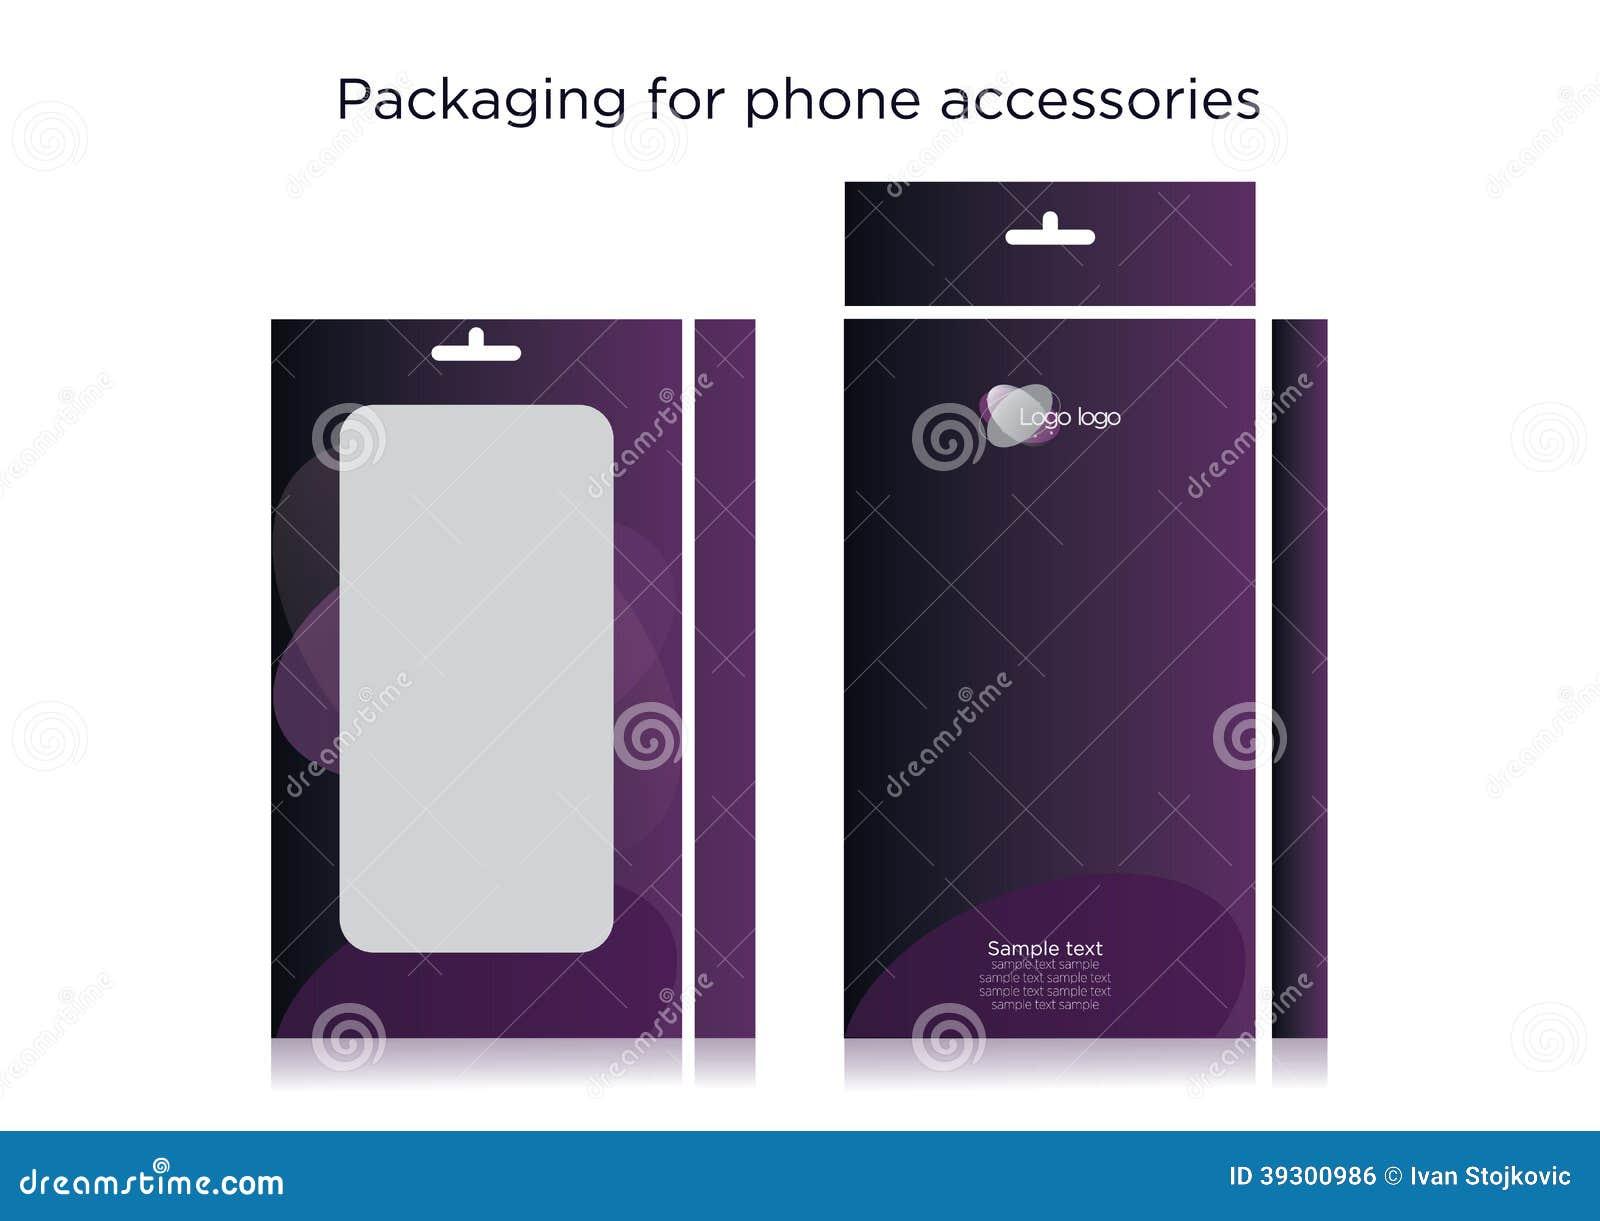 Mobile Phone Shop Business Plan